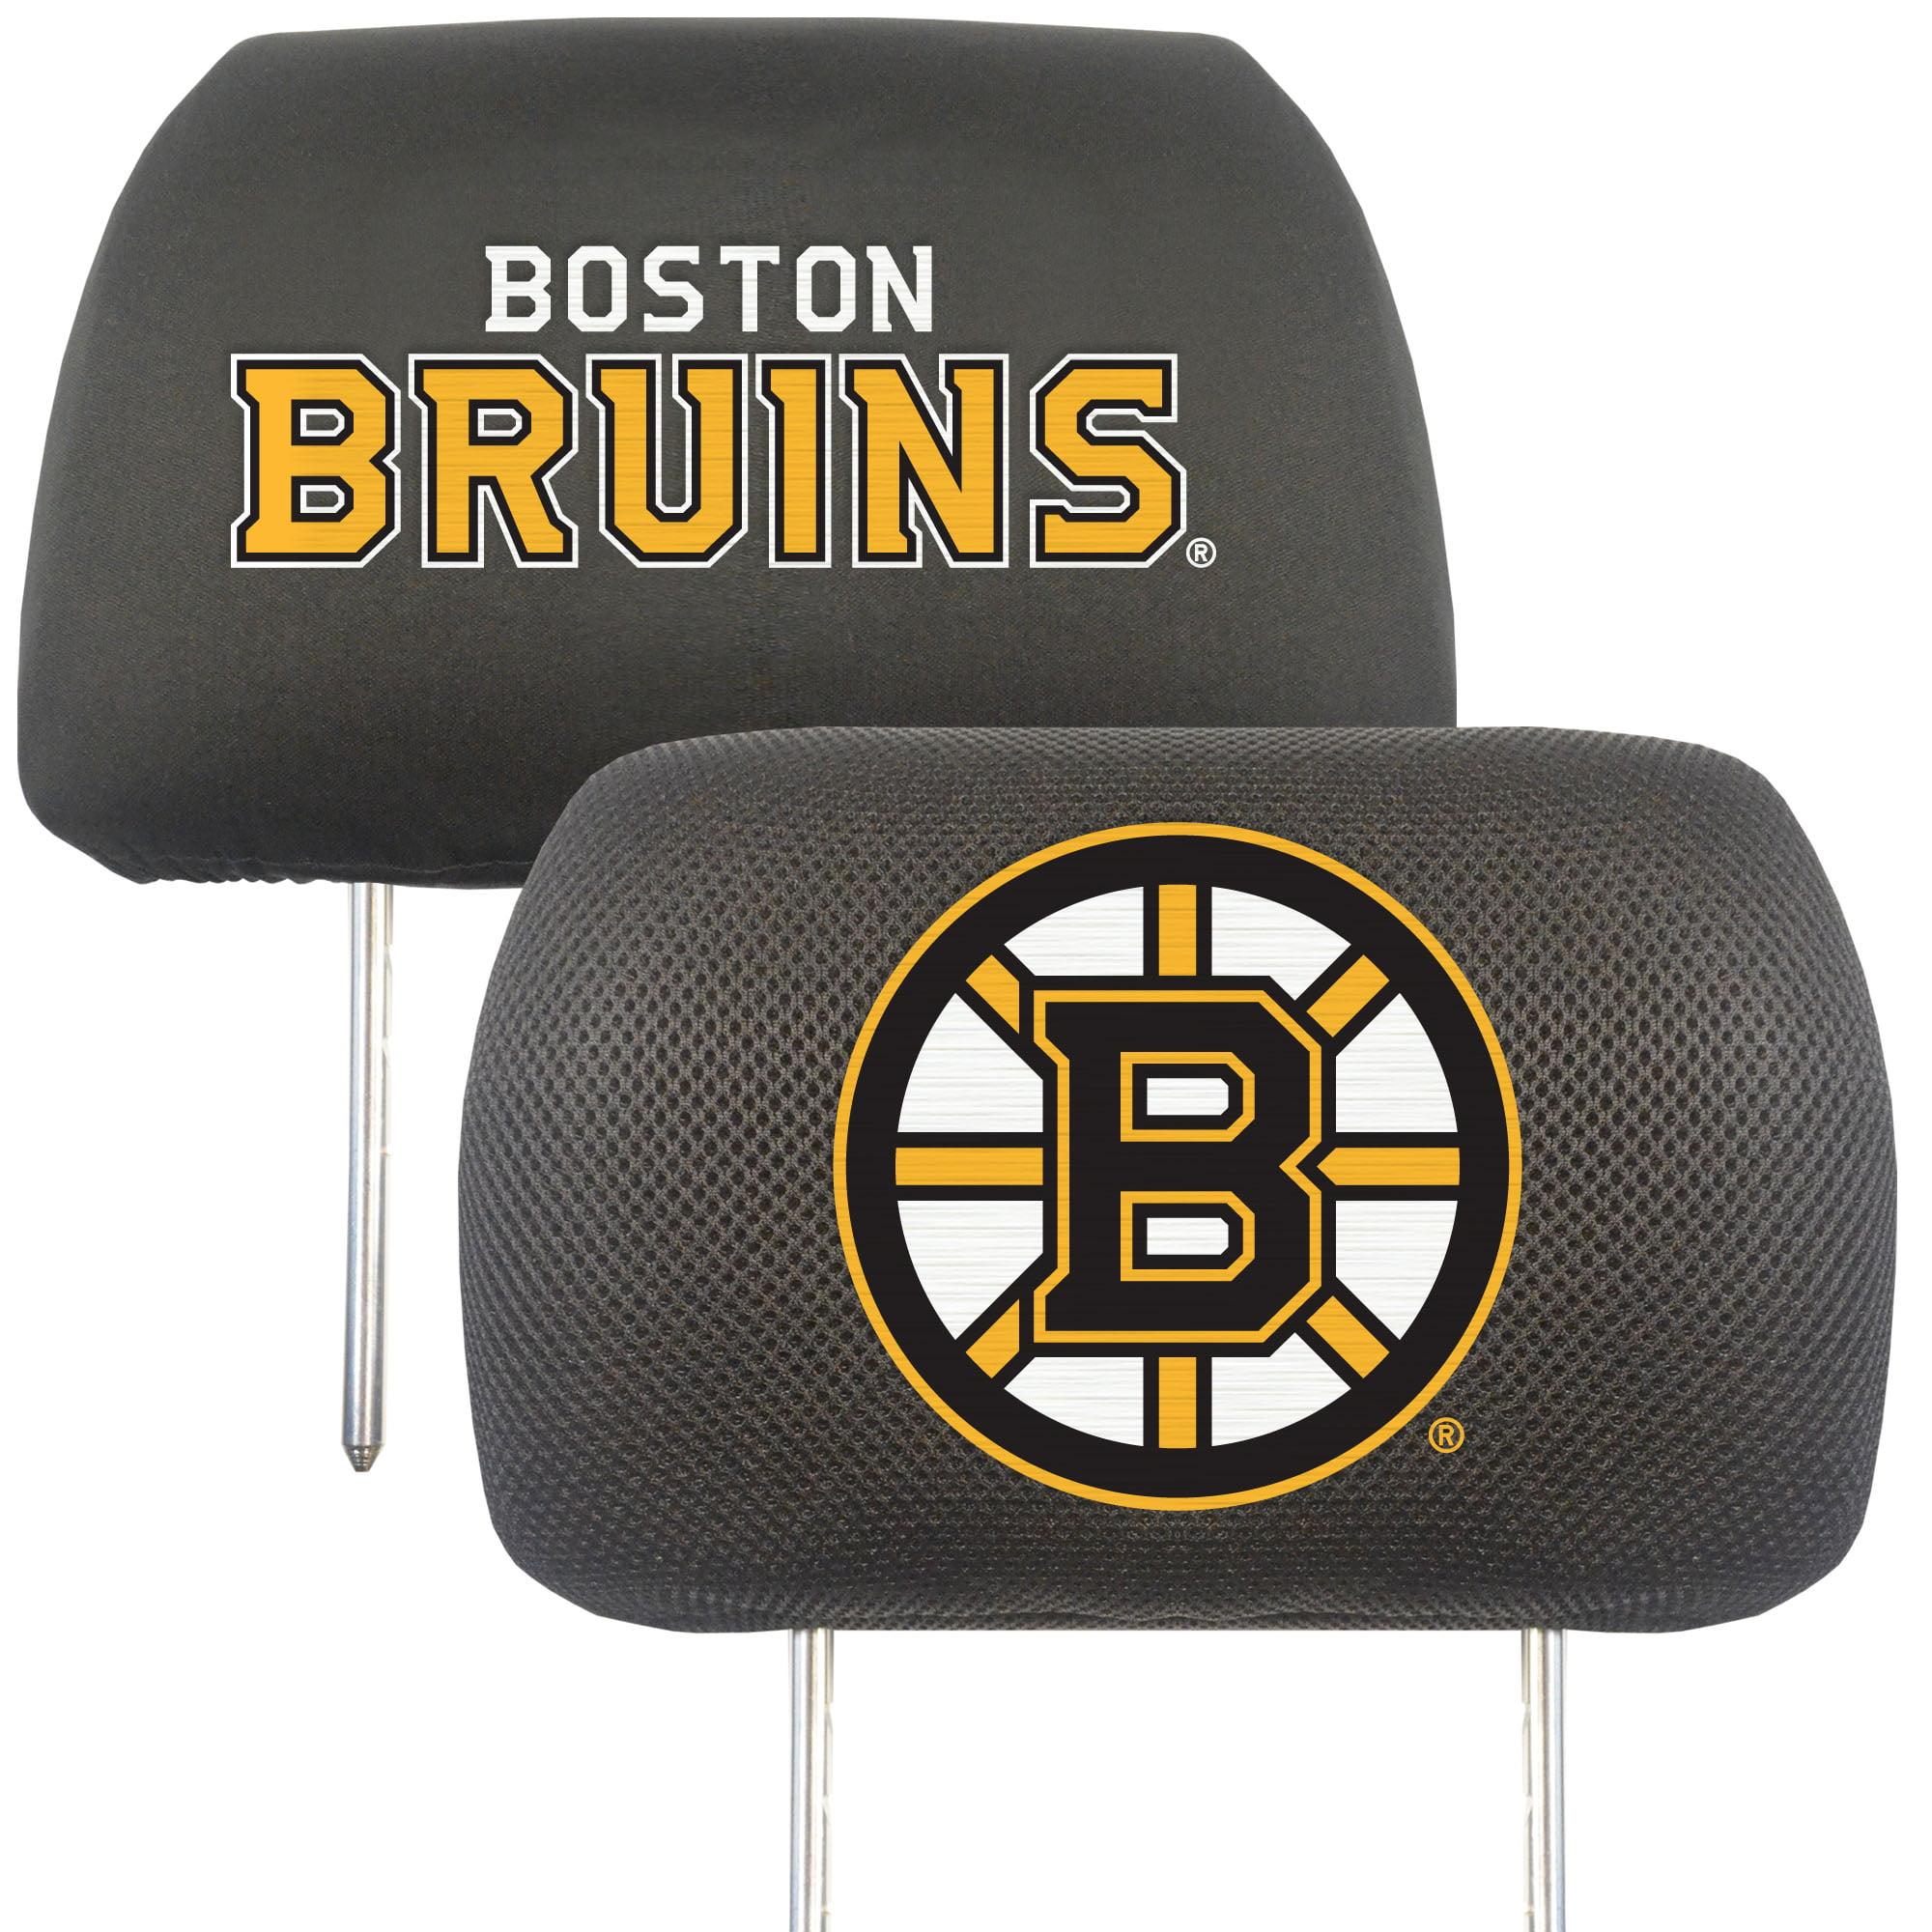 NHL Boston Bruins Head Rest Cover Automotive Accessory